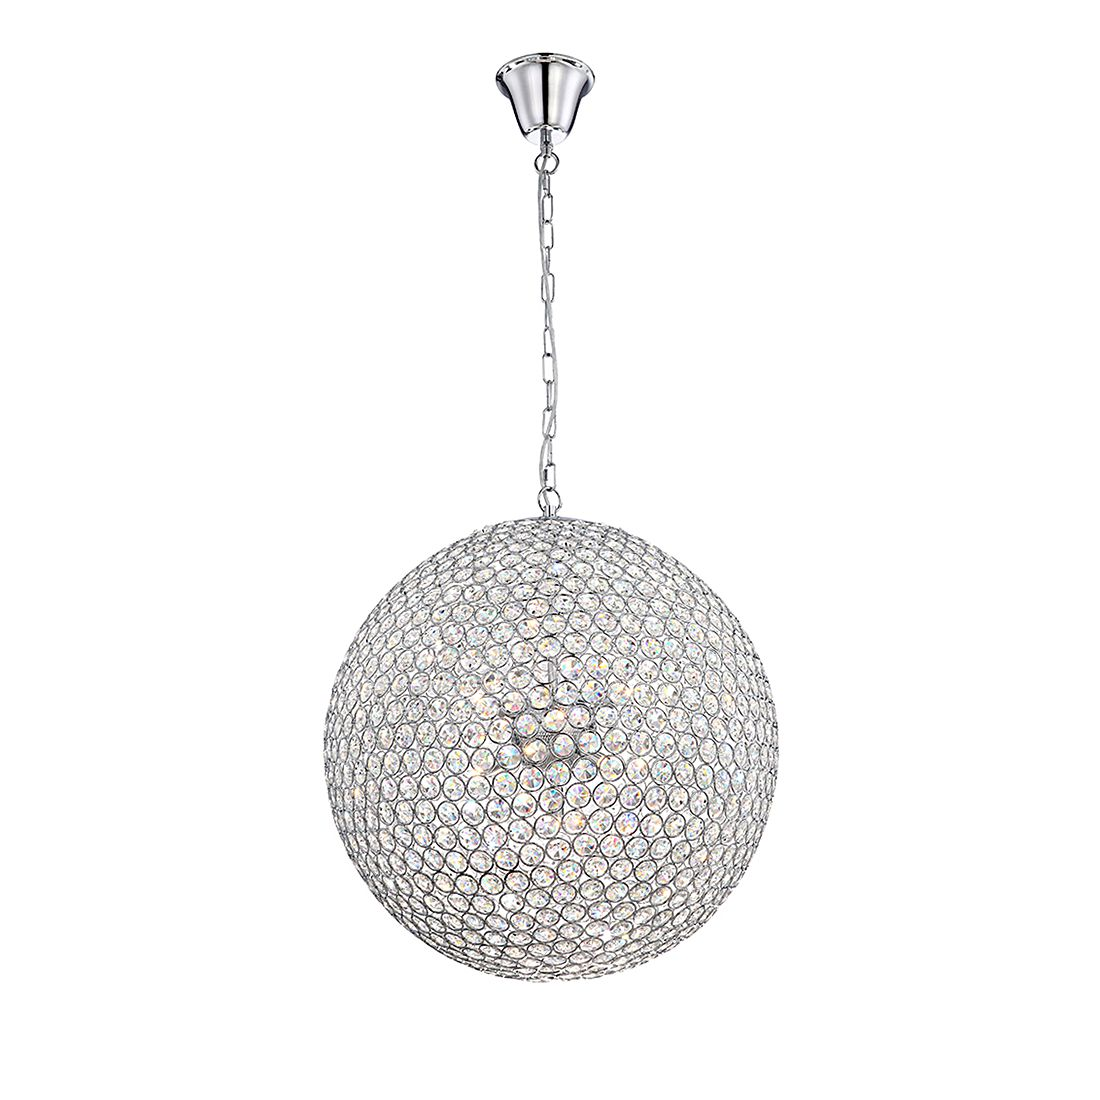 EEK A++, Hängeleuchte EMILIA I – Metall – Silber – 8-flammig, Globo Lighting günstig kaufen